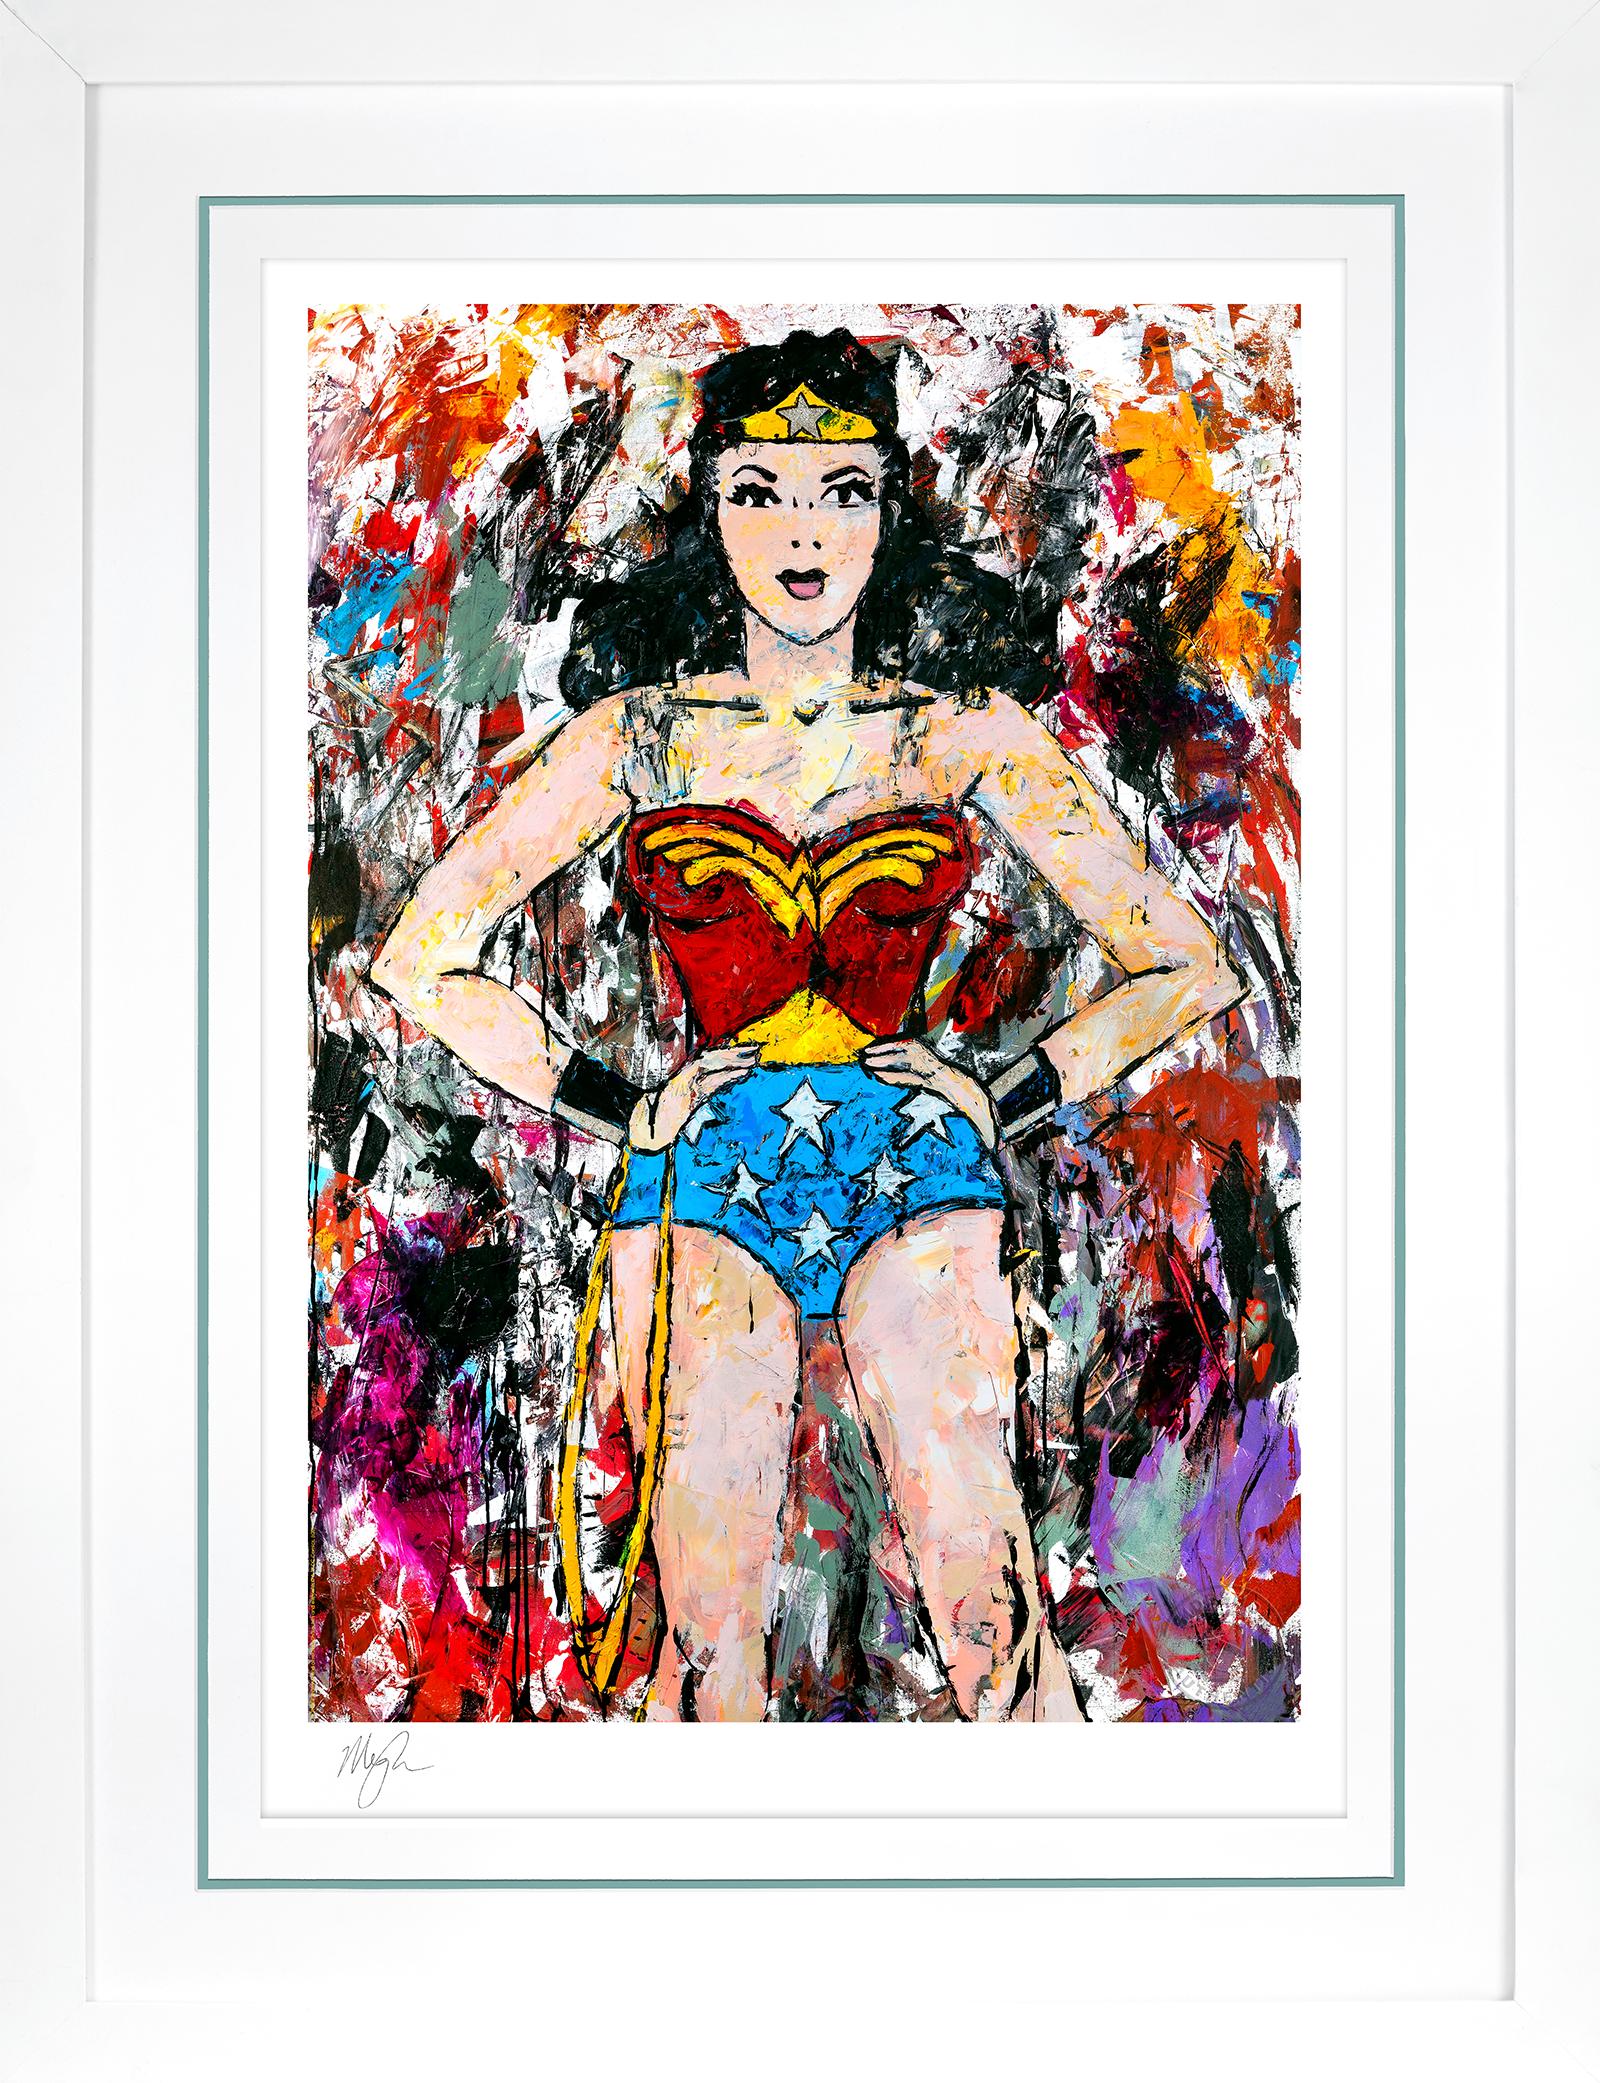 Sideshow Collectibles Golden Age Wonder Woman Art Print